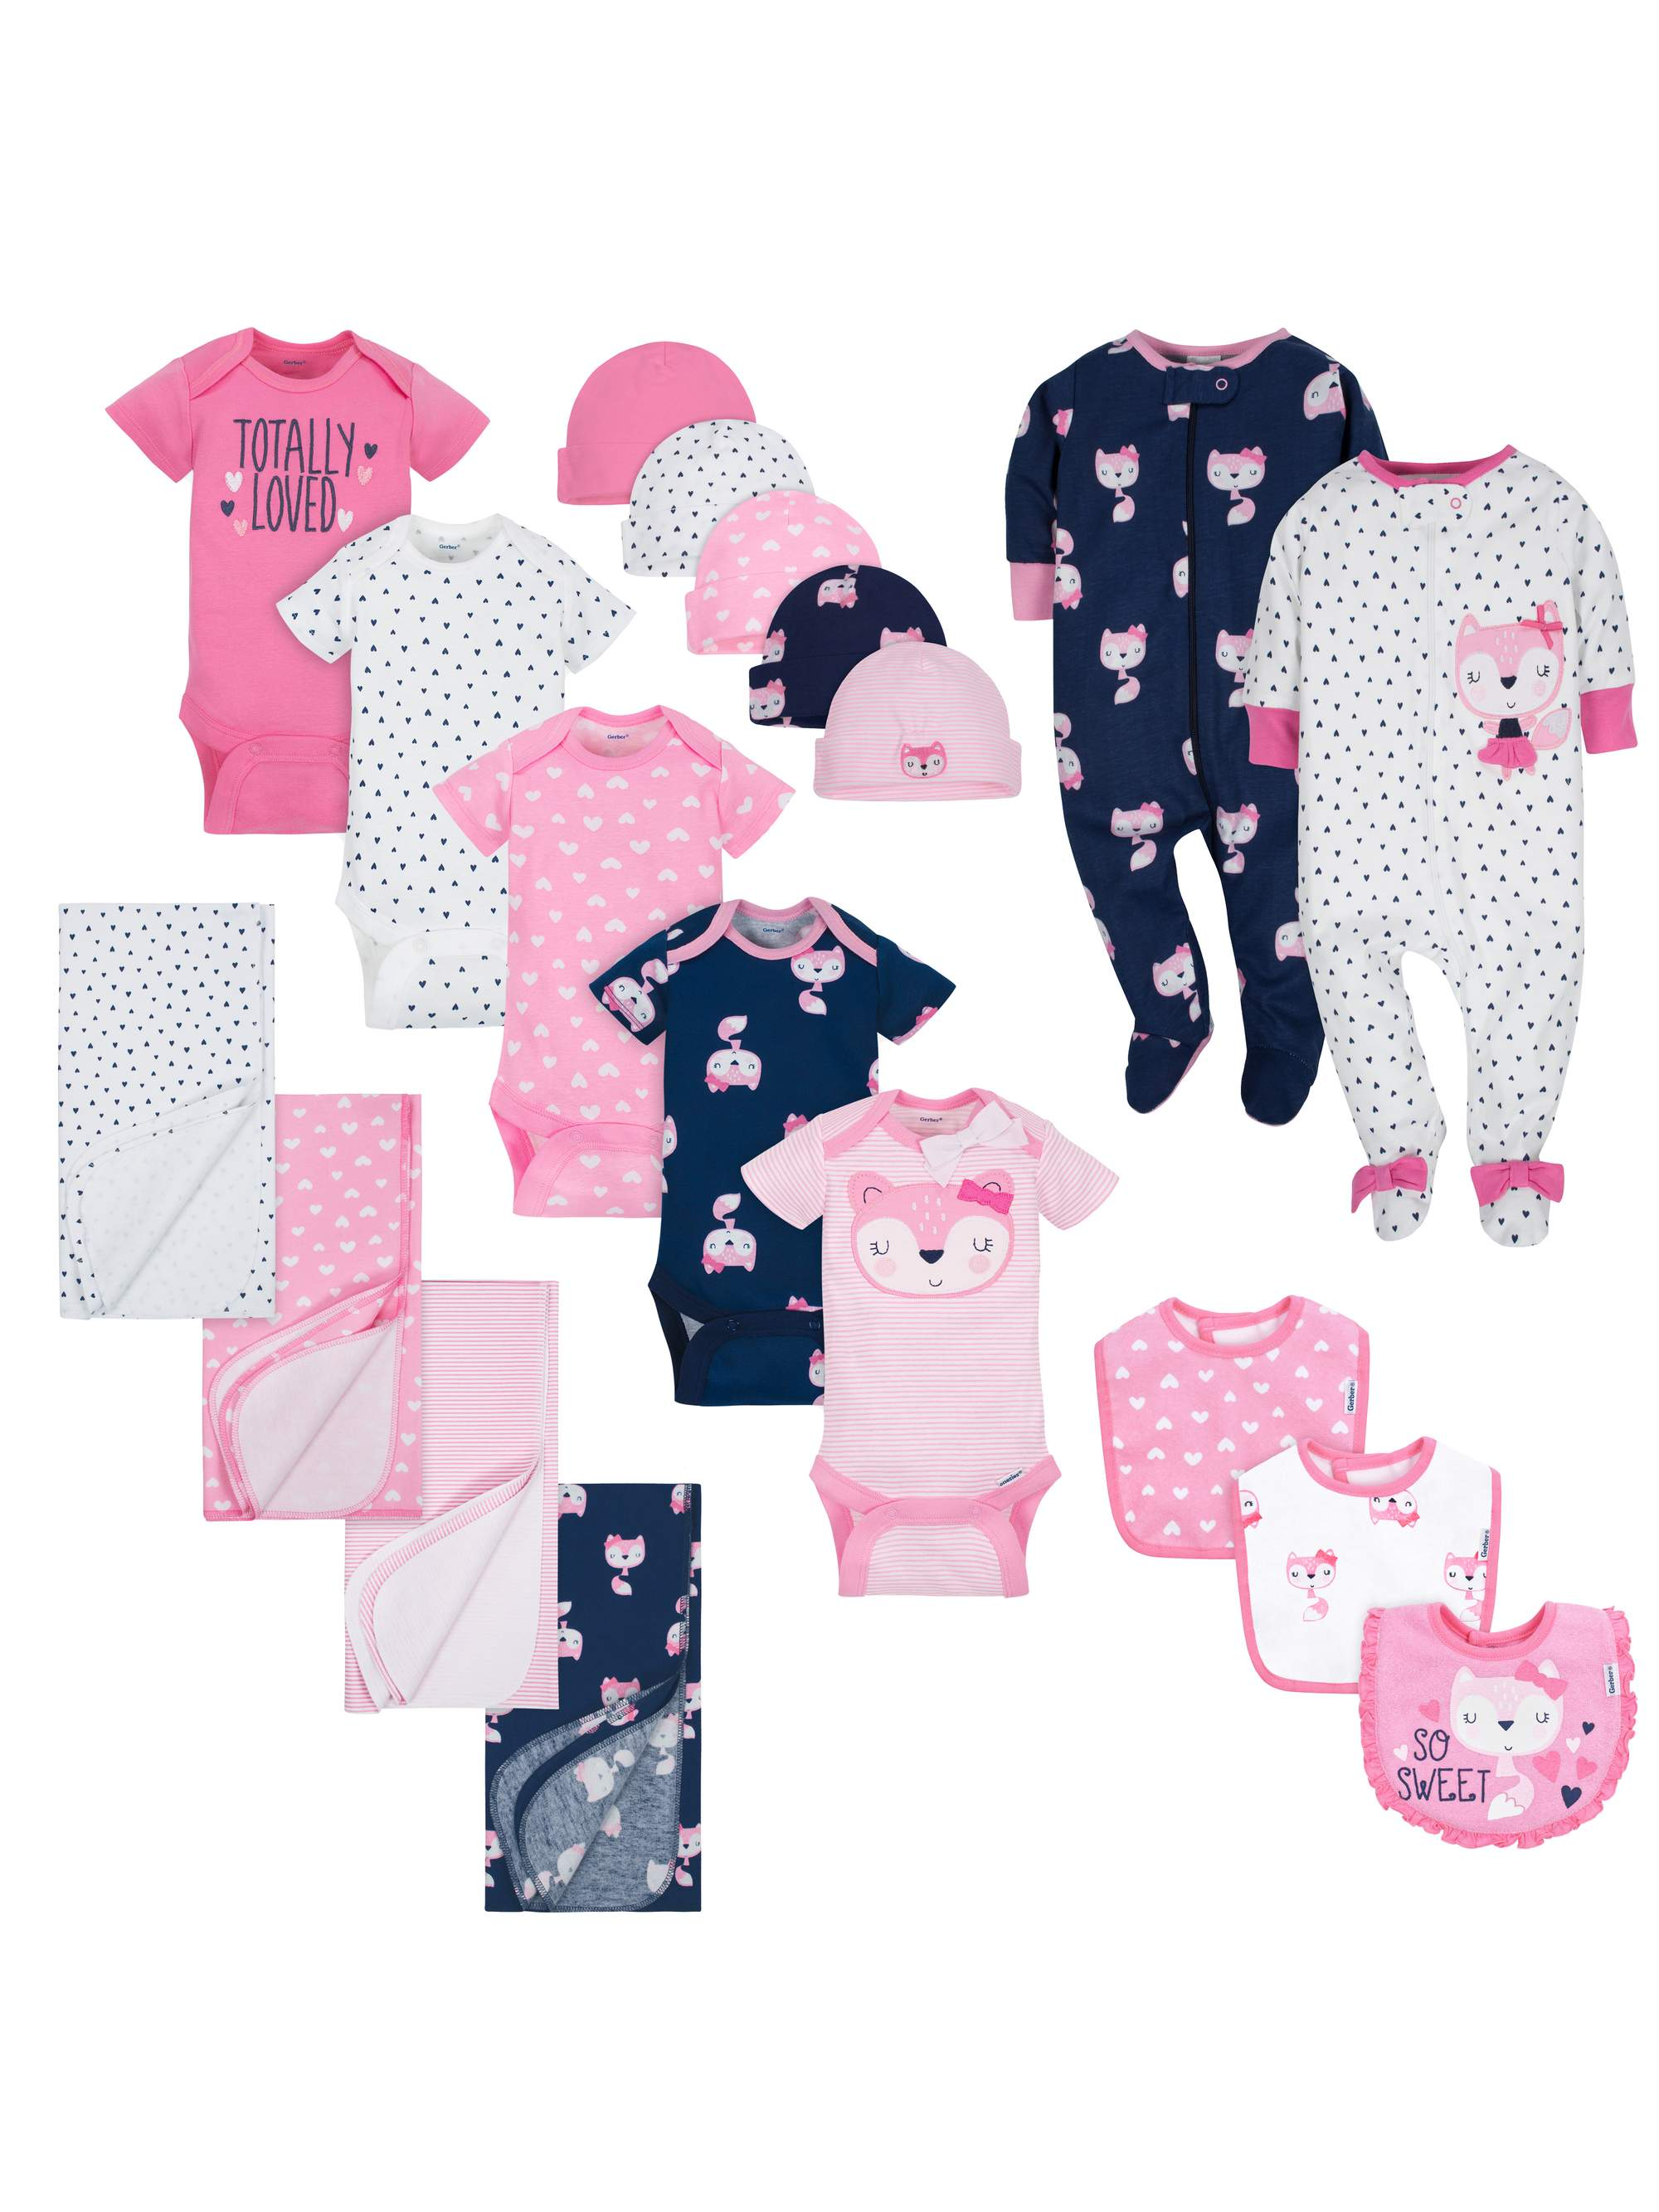 Layette Essentials Baby Shower Gift Set, 19pc (Baby Girl)